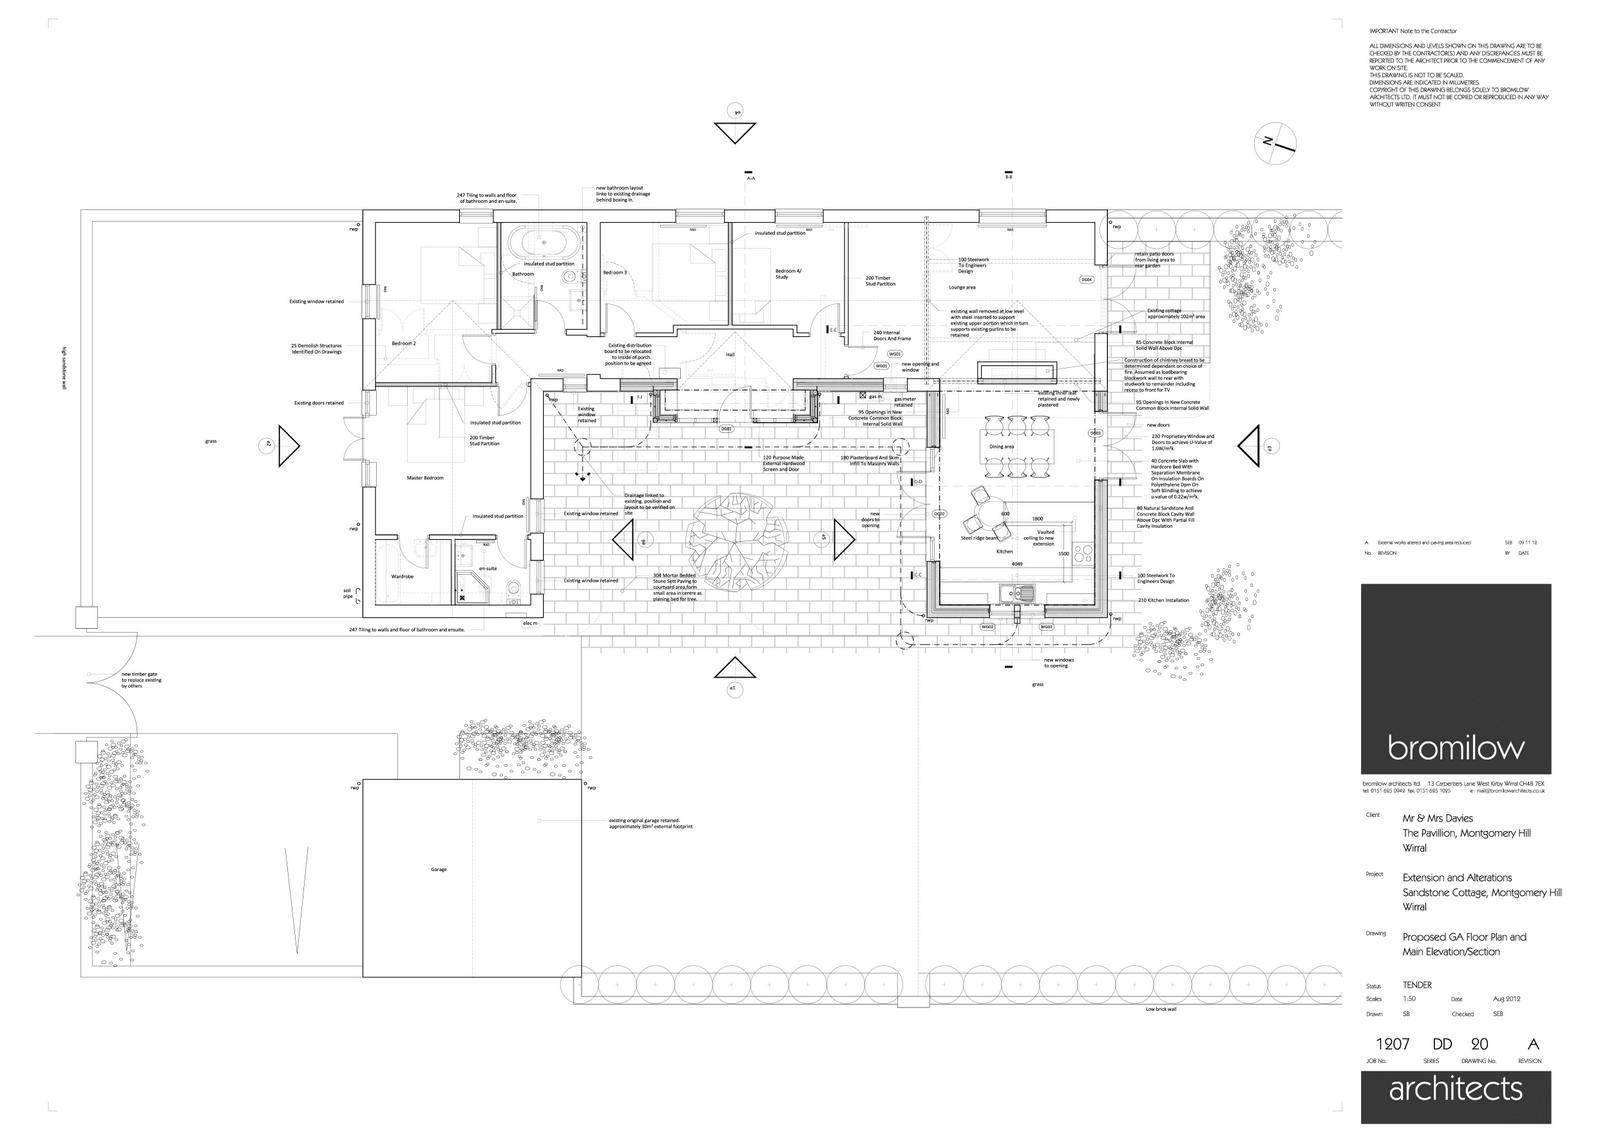 https://i0.wp.com/www.bromilowarchitects.co.uk/wp-content/uploads/2013/05/1207-DD-020A-Sandstone-Cottage-Proposed-GA-Plan-A1.jpg?fit=1600%2C1130&ssl=1